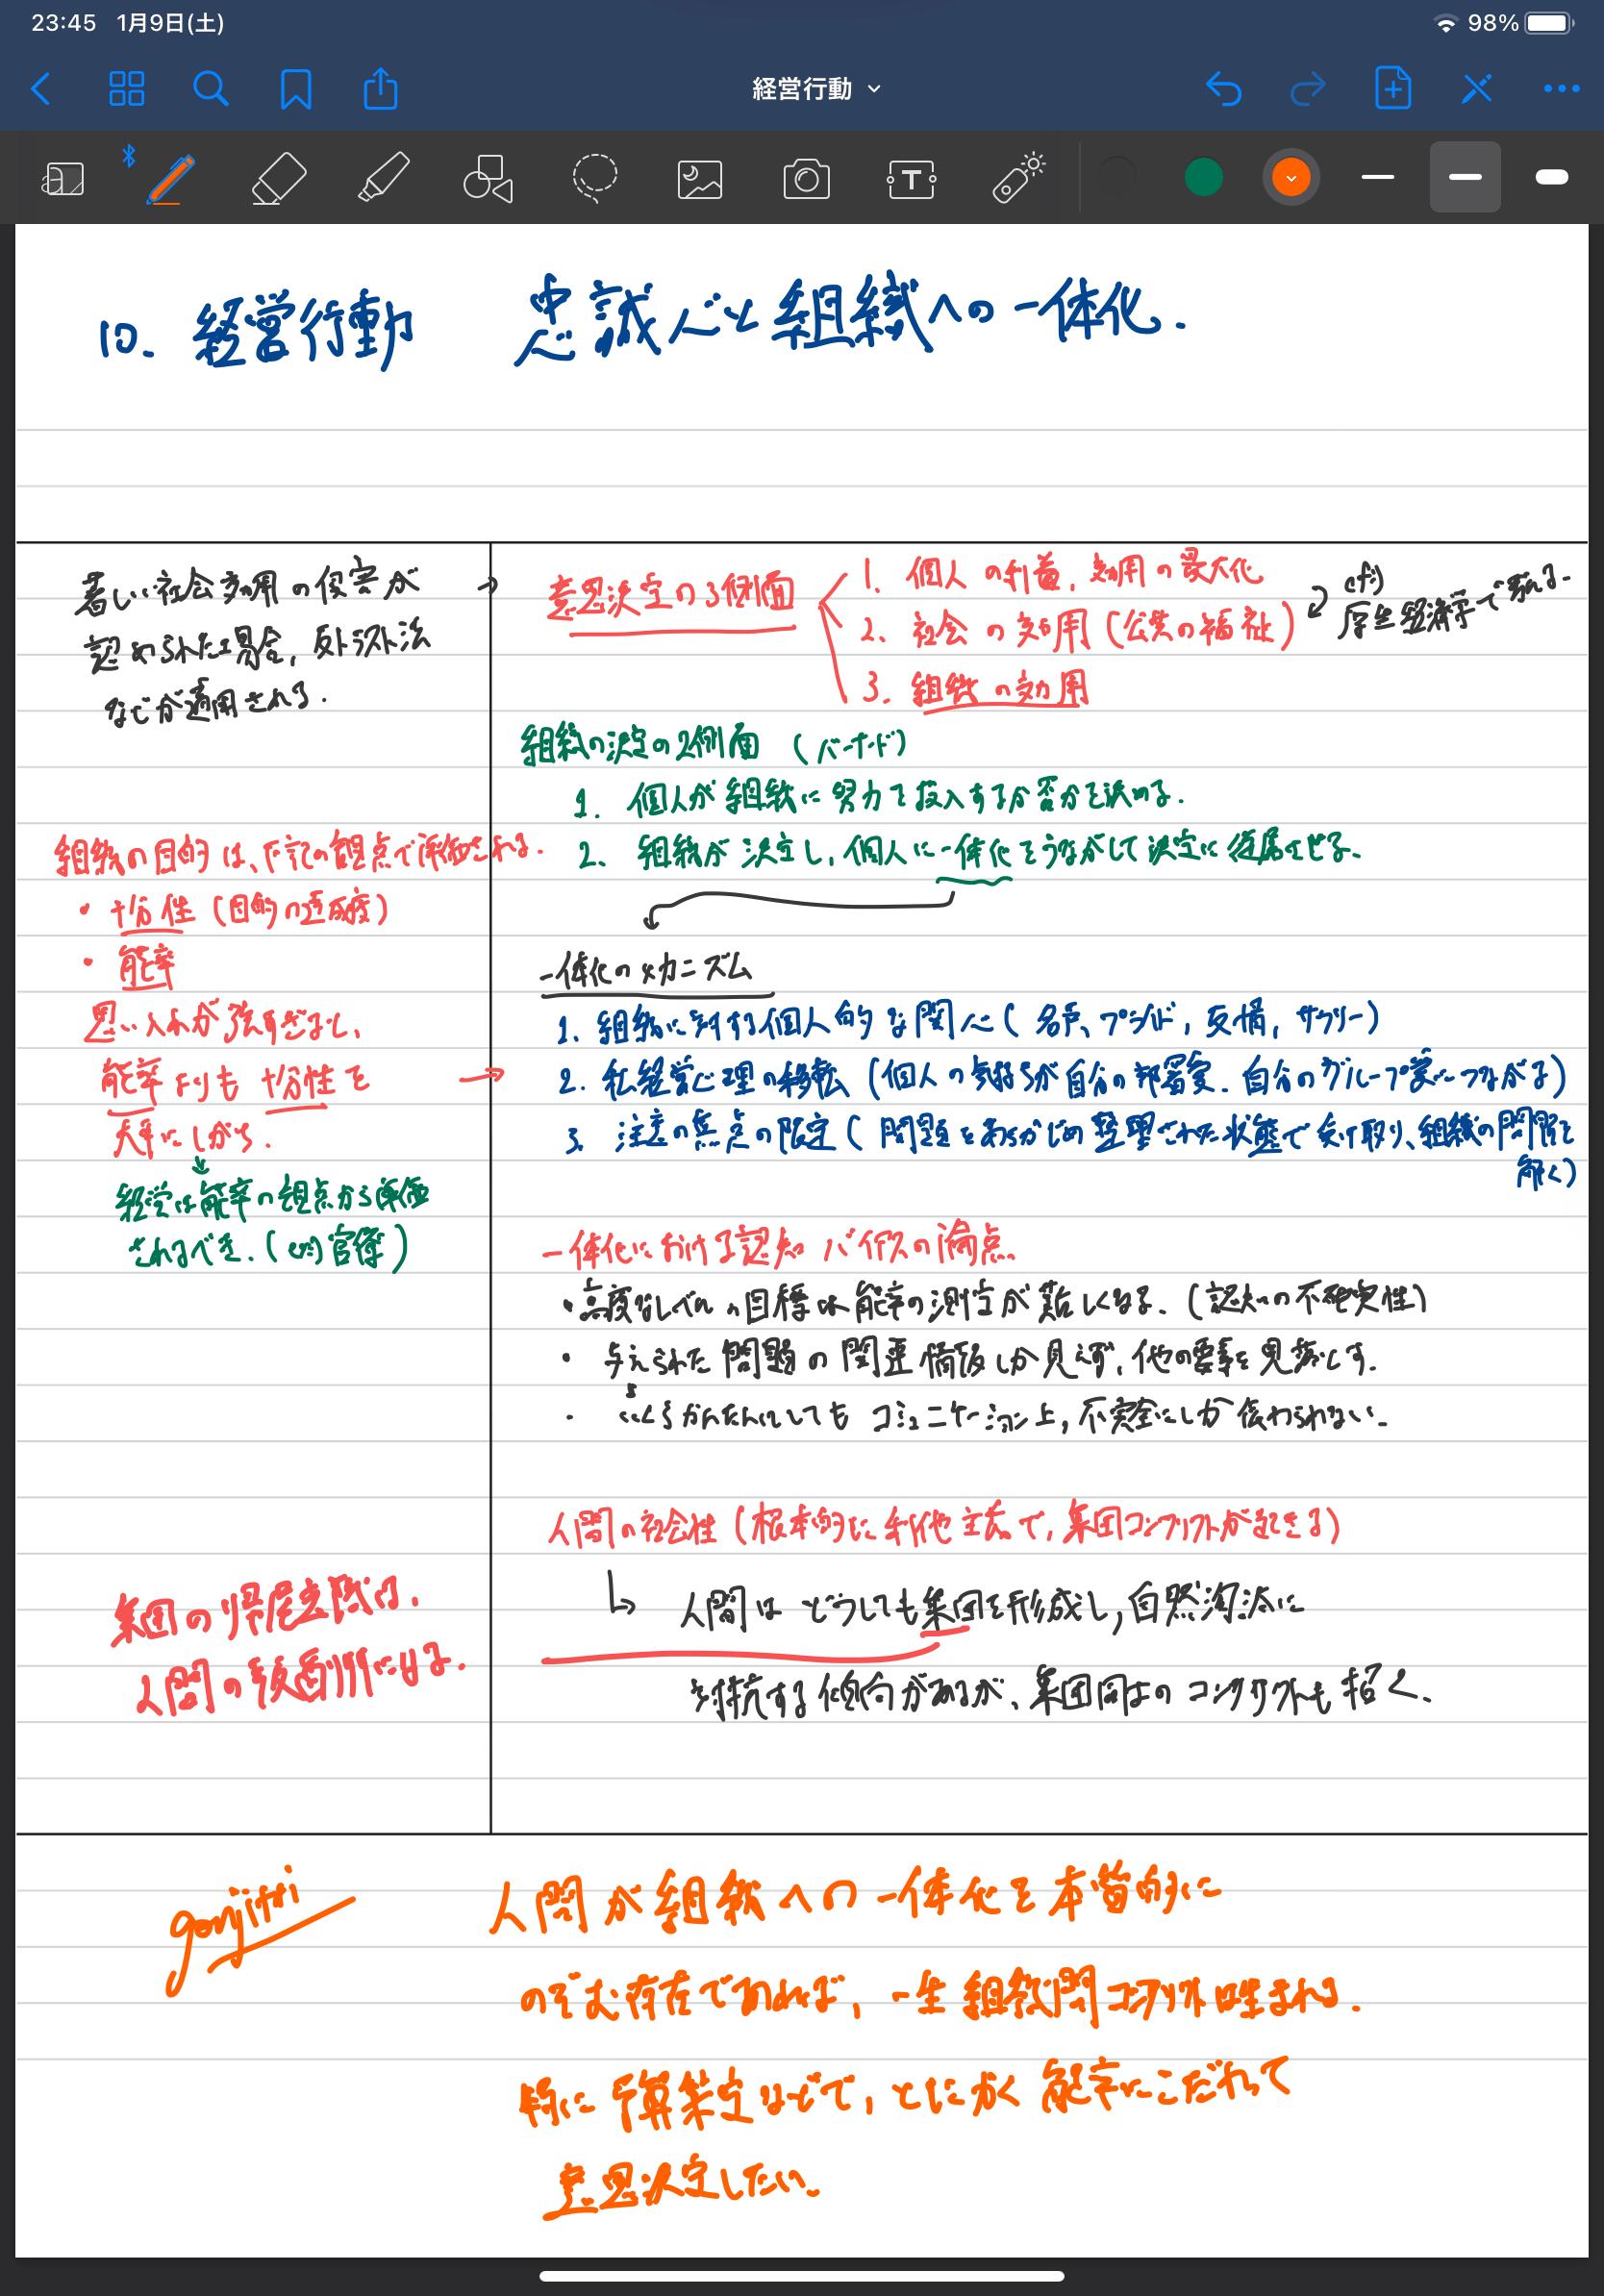 behavior-10-image